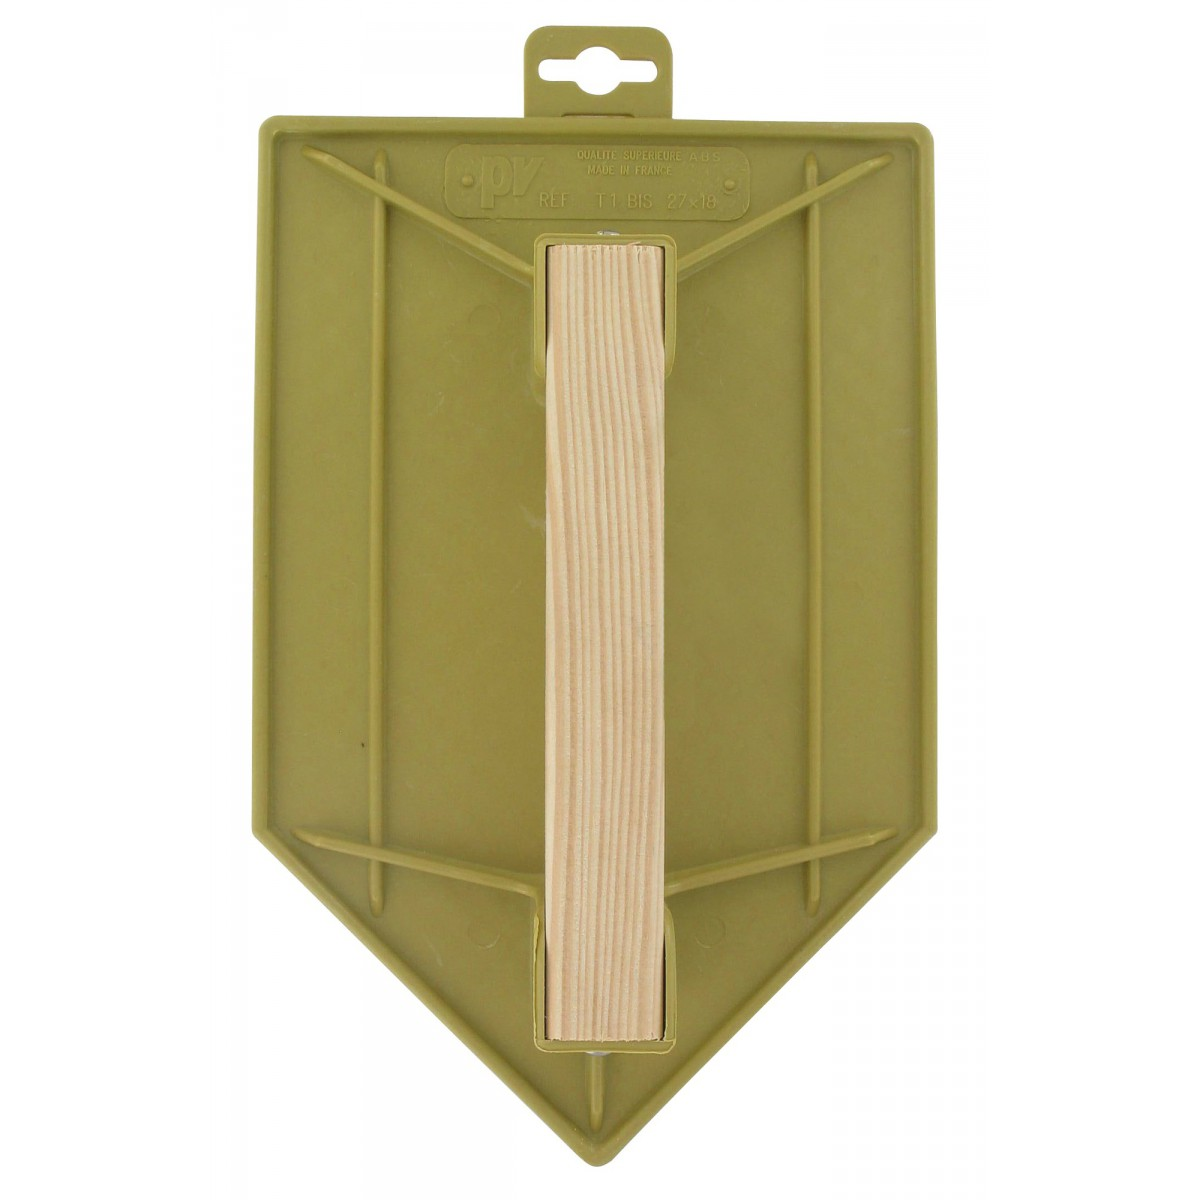 Taloche plastique ABS jaune triangulaire Outibat - Dimensions 18 x 27 cm